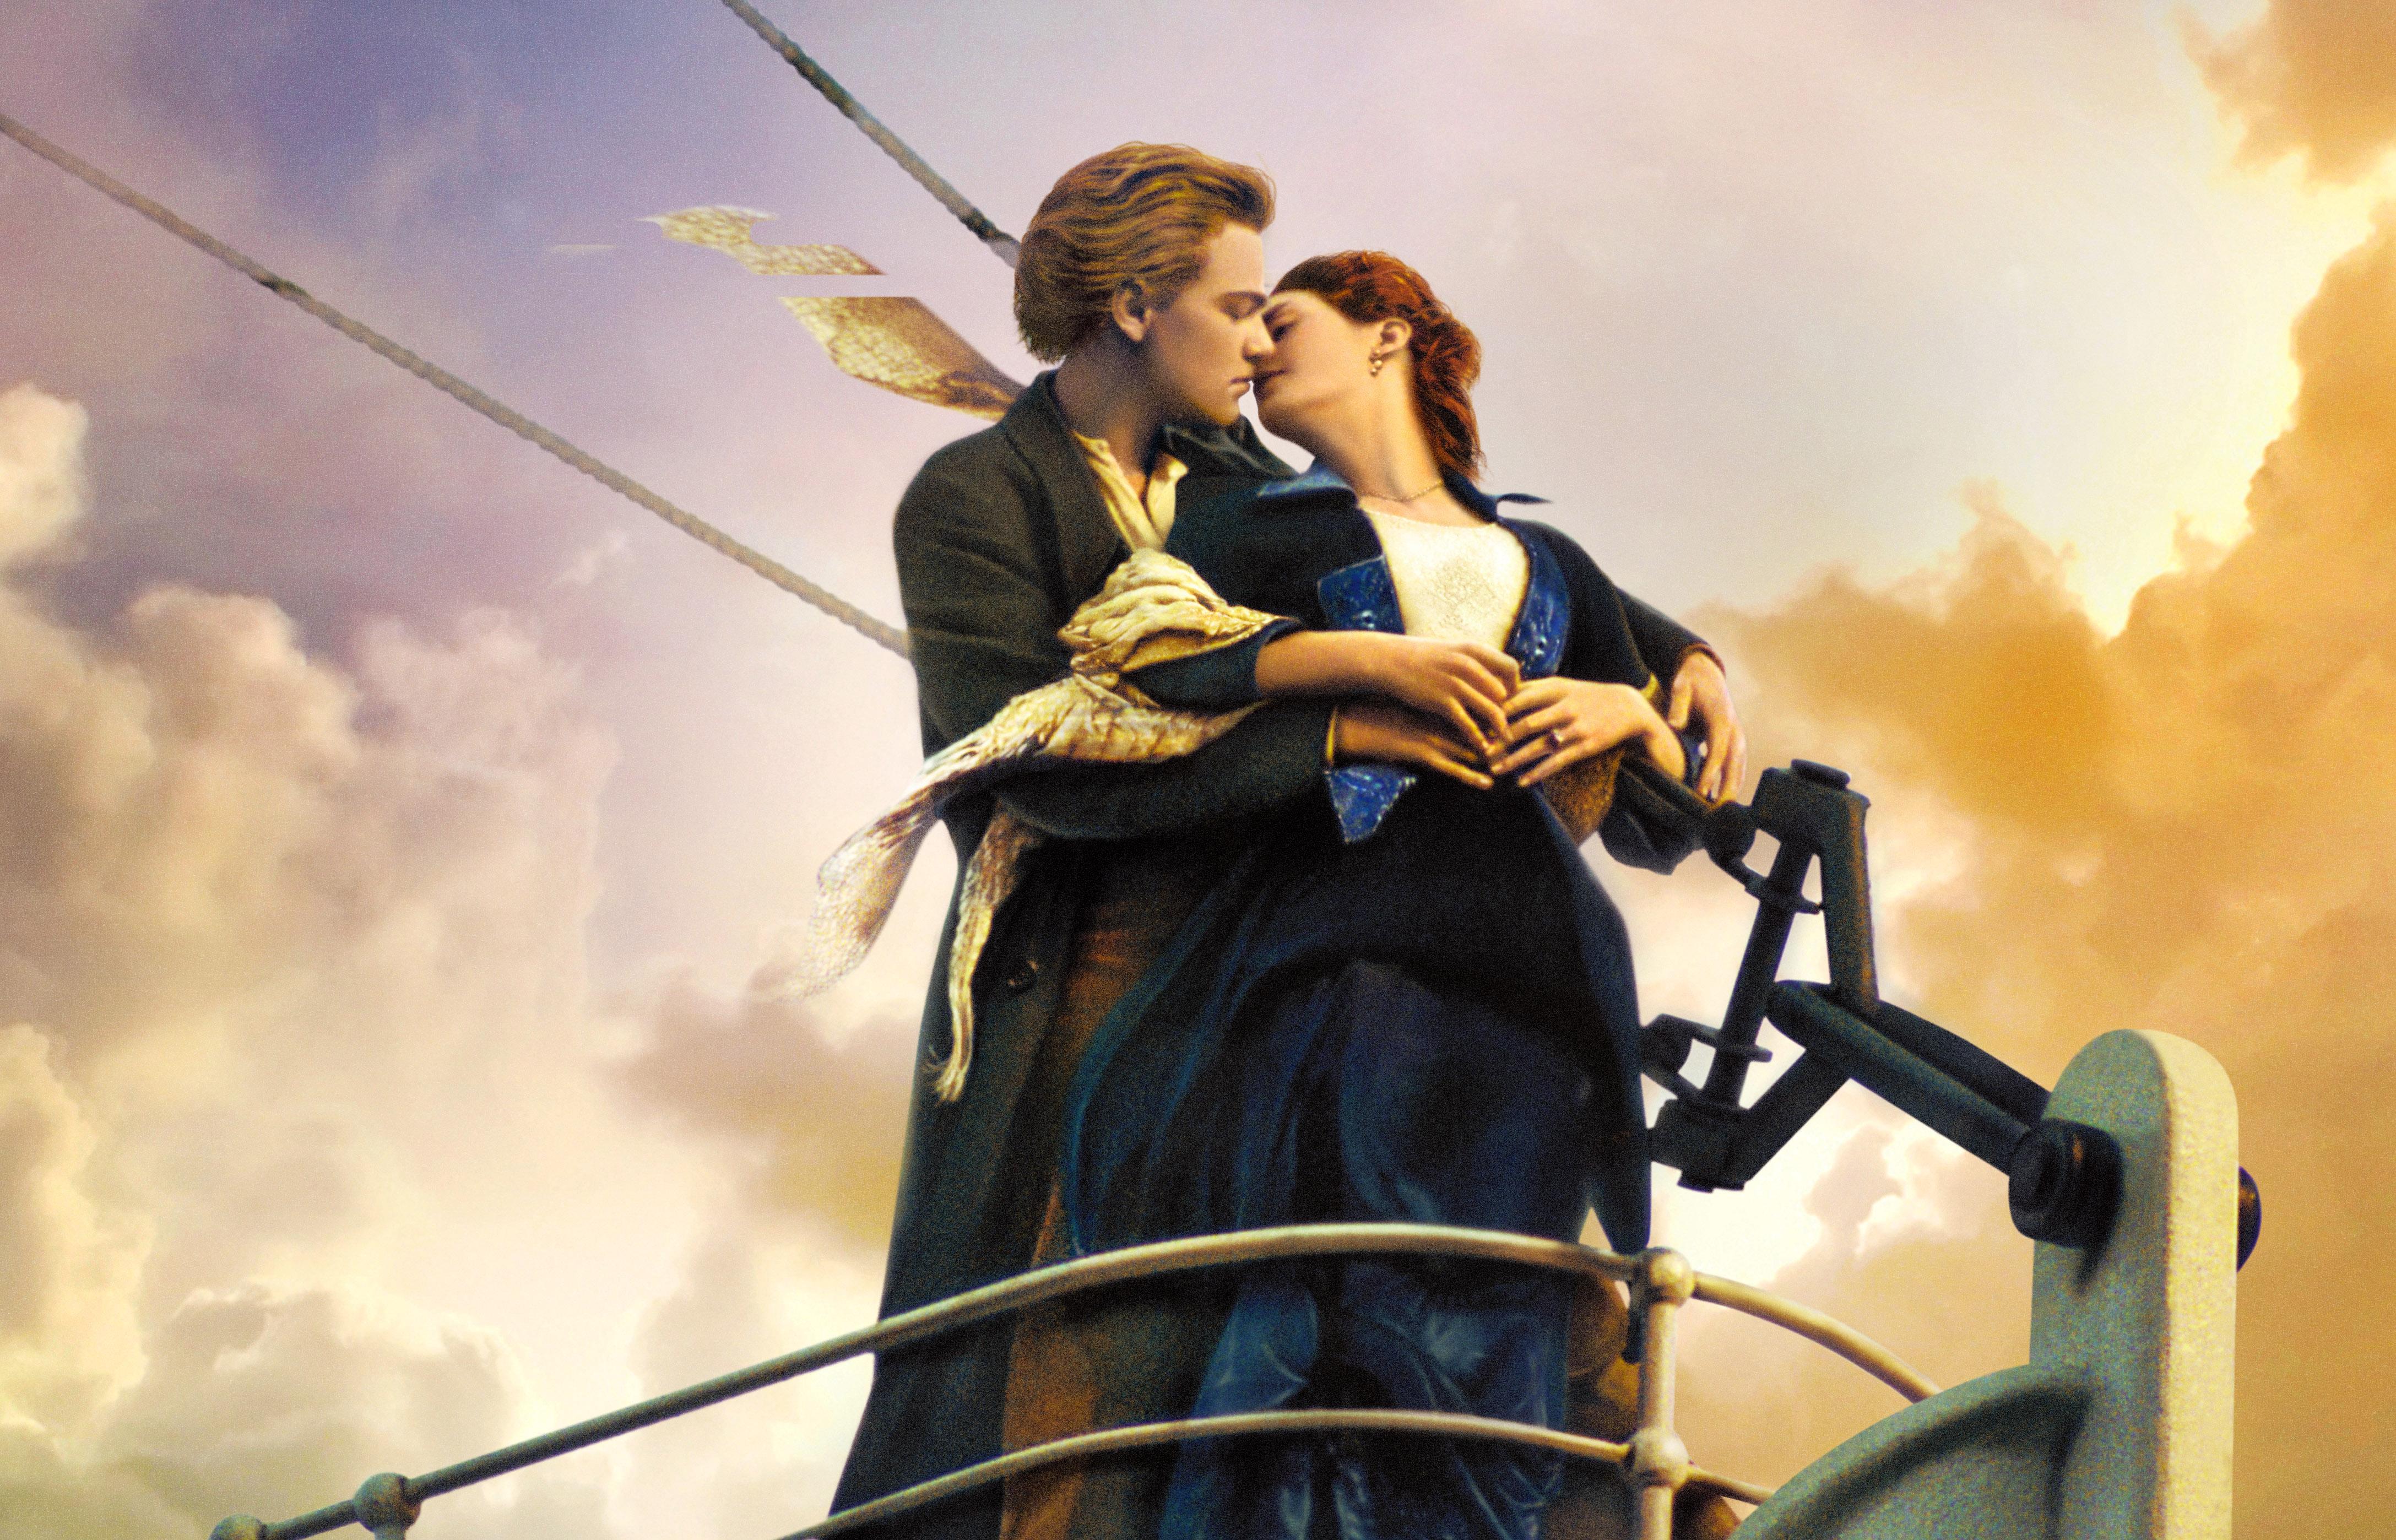 Titanic 4k Ultra HD Wallpaper   Background Image ...